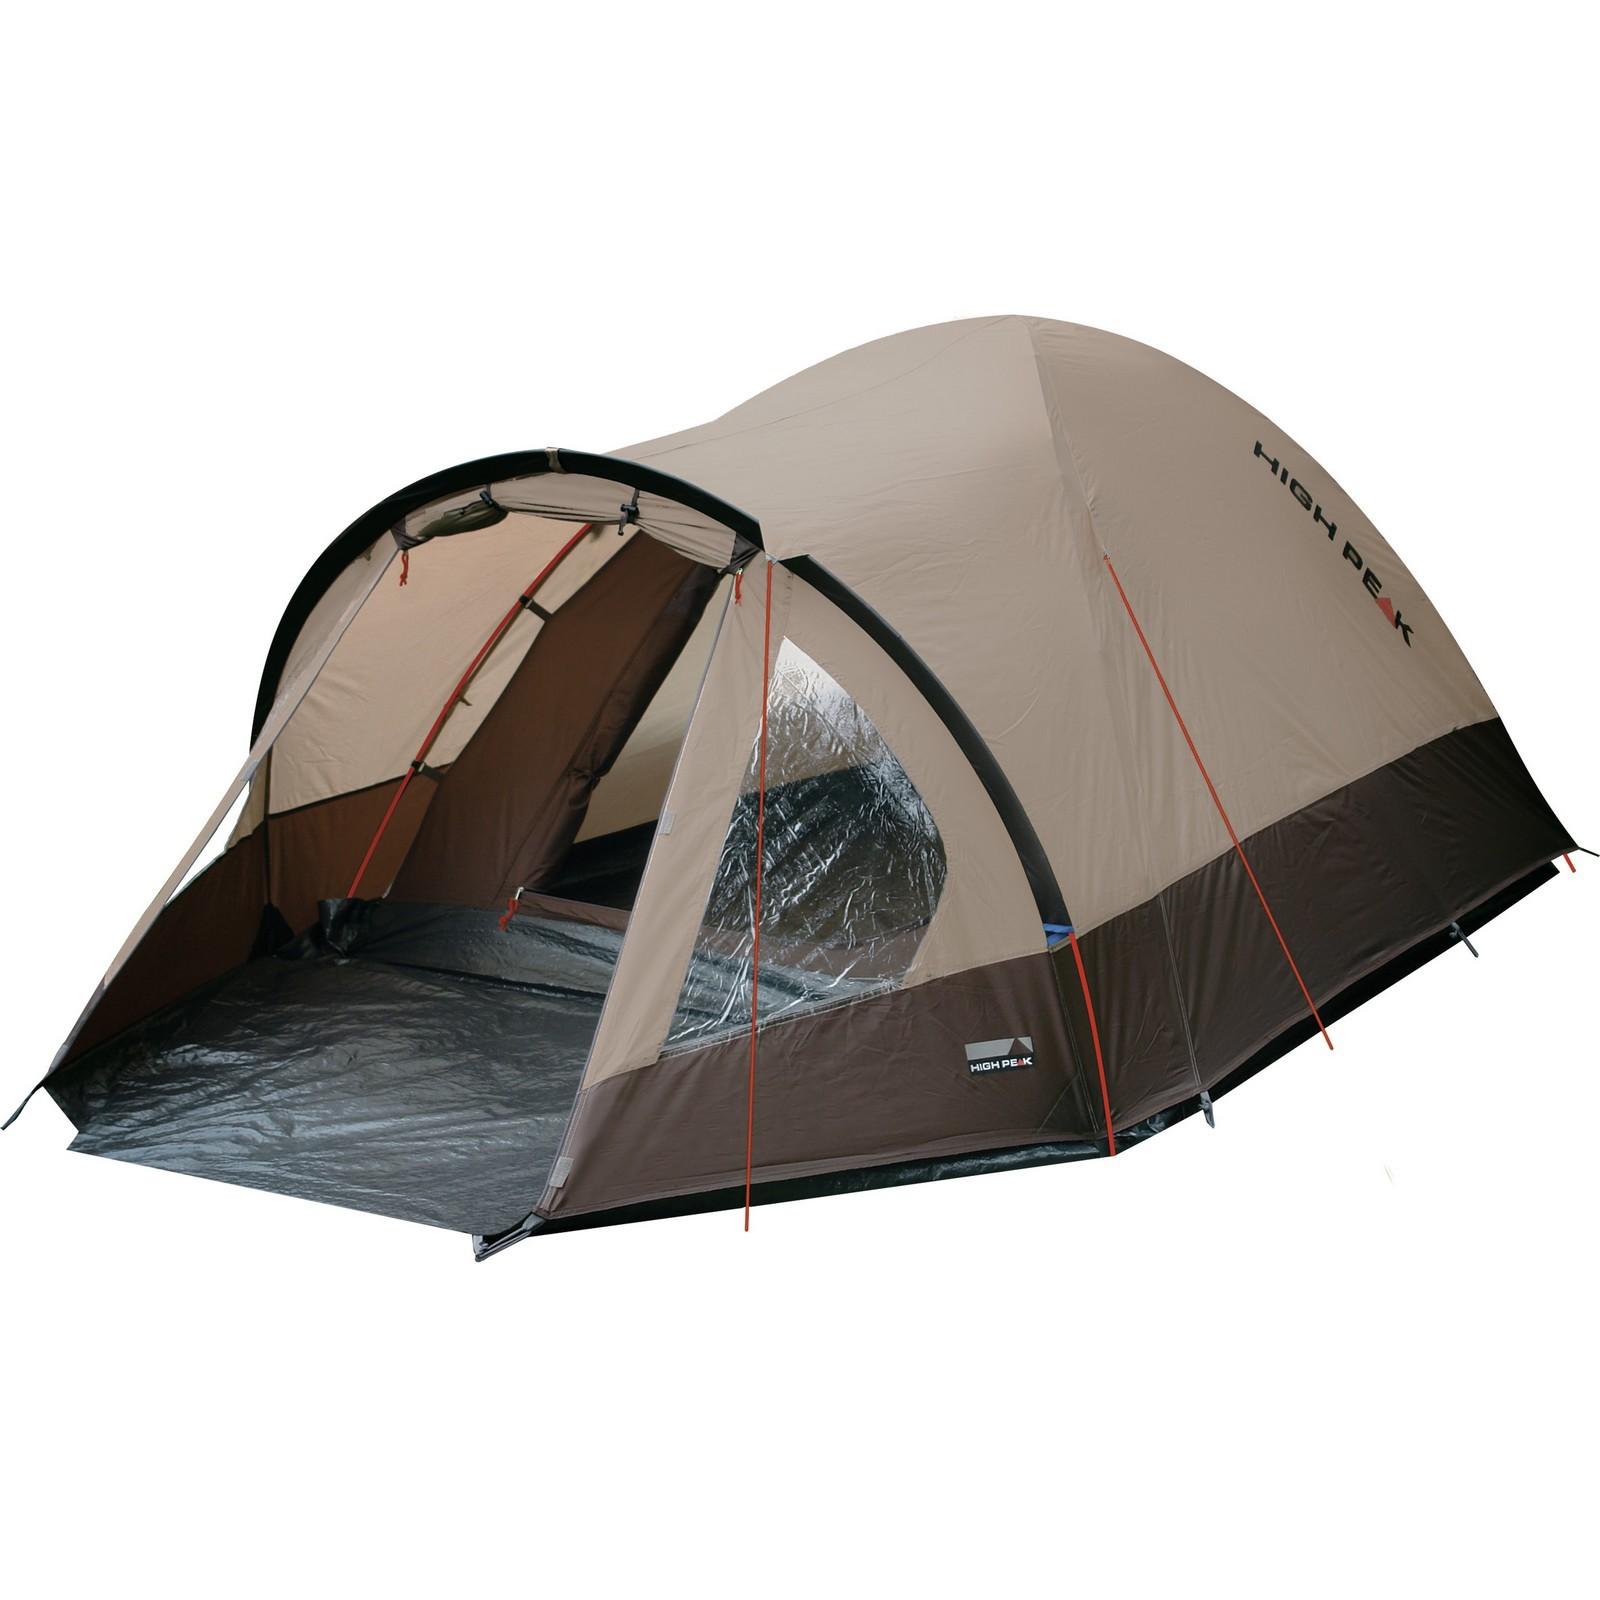 zelt talos 3 campingzelt tunnelzelt f r 3 personen von high peak ebay. Black Bedroom Furniture Sets. Home Design Ideas